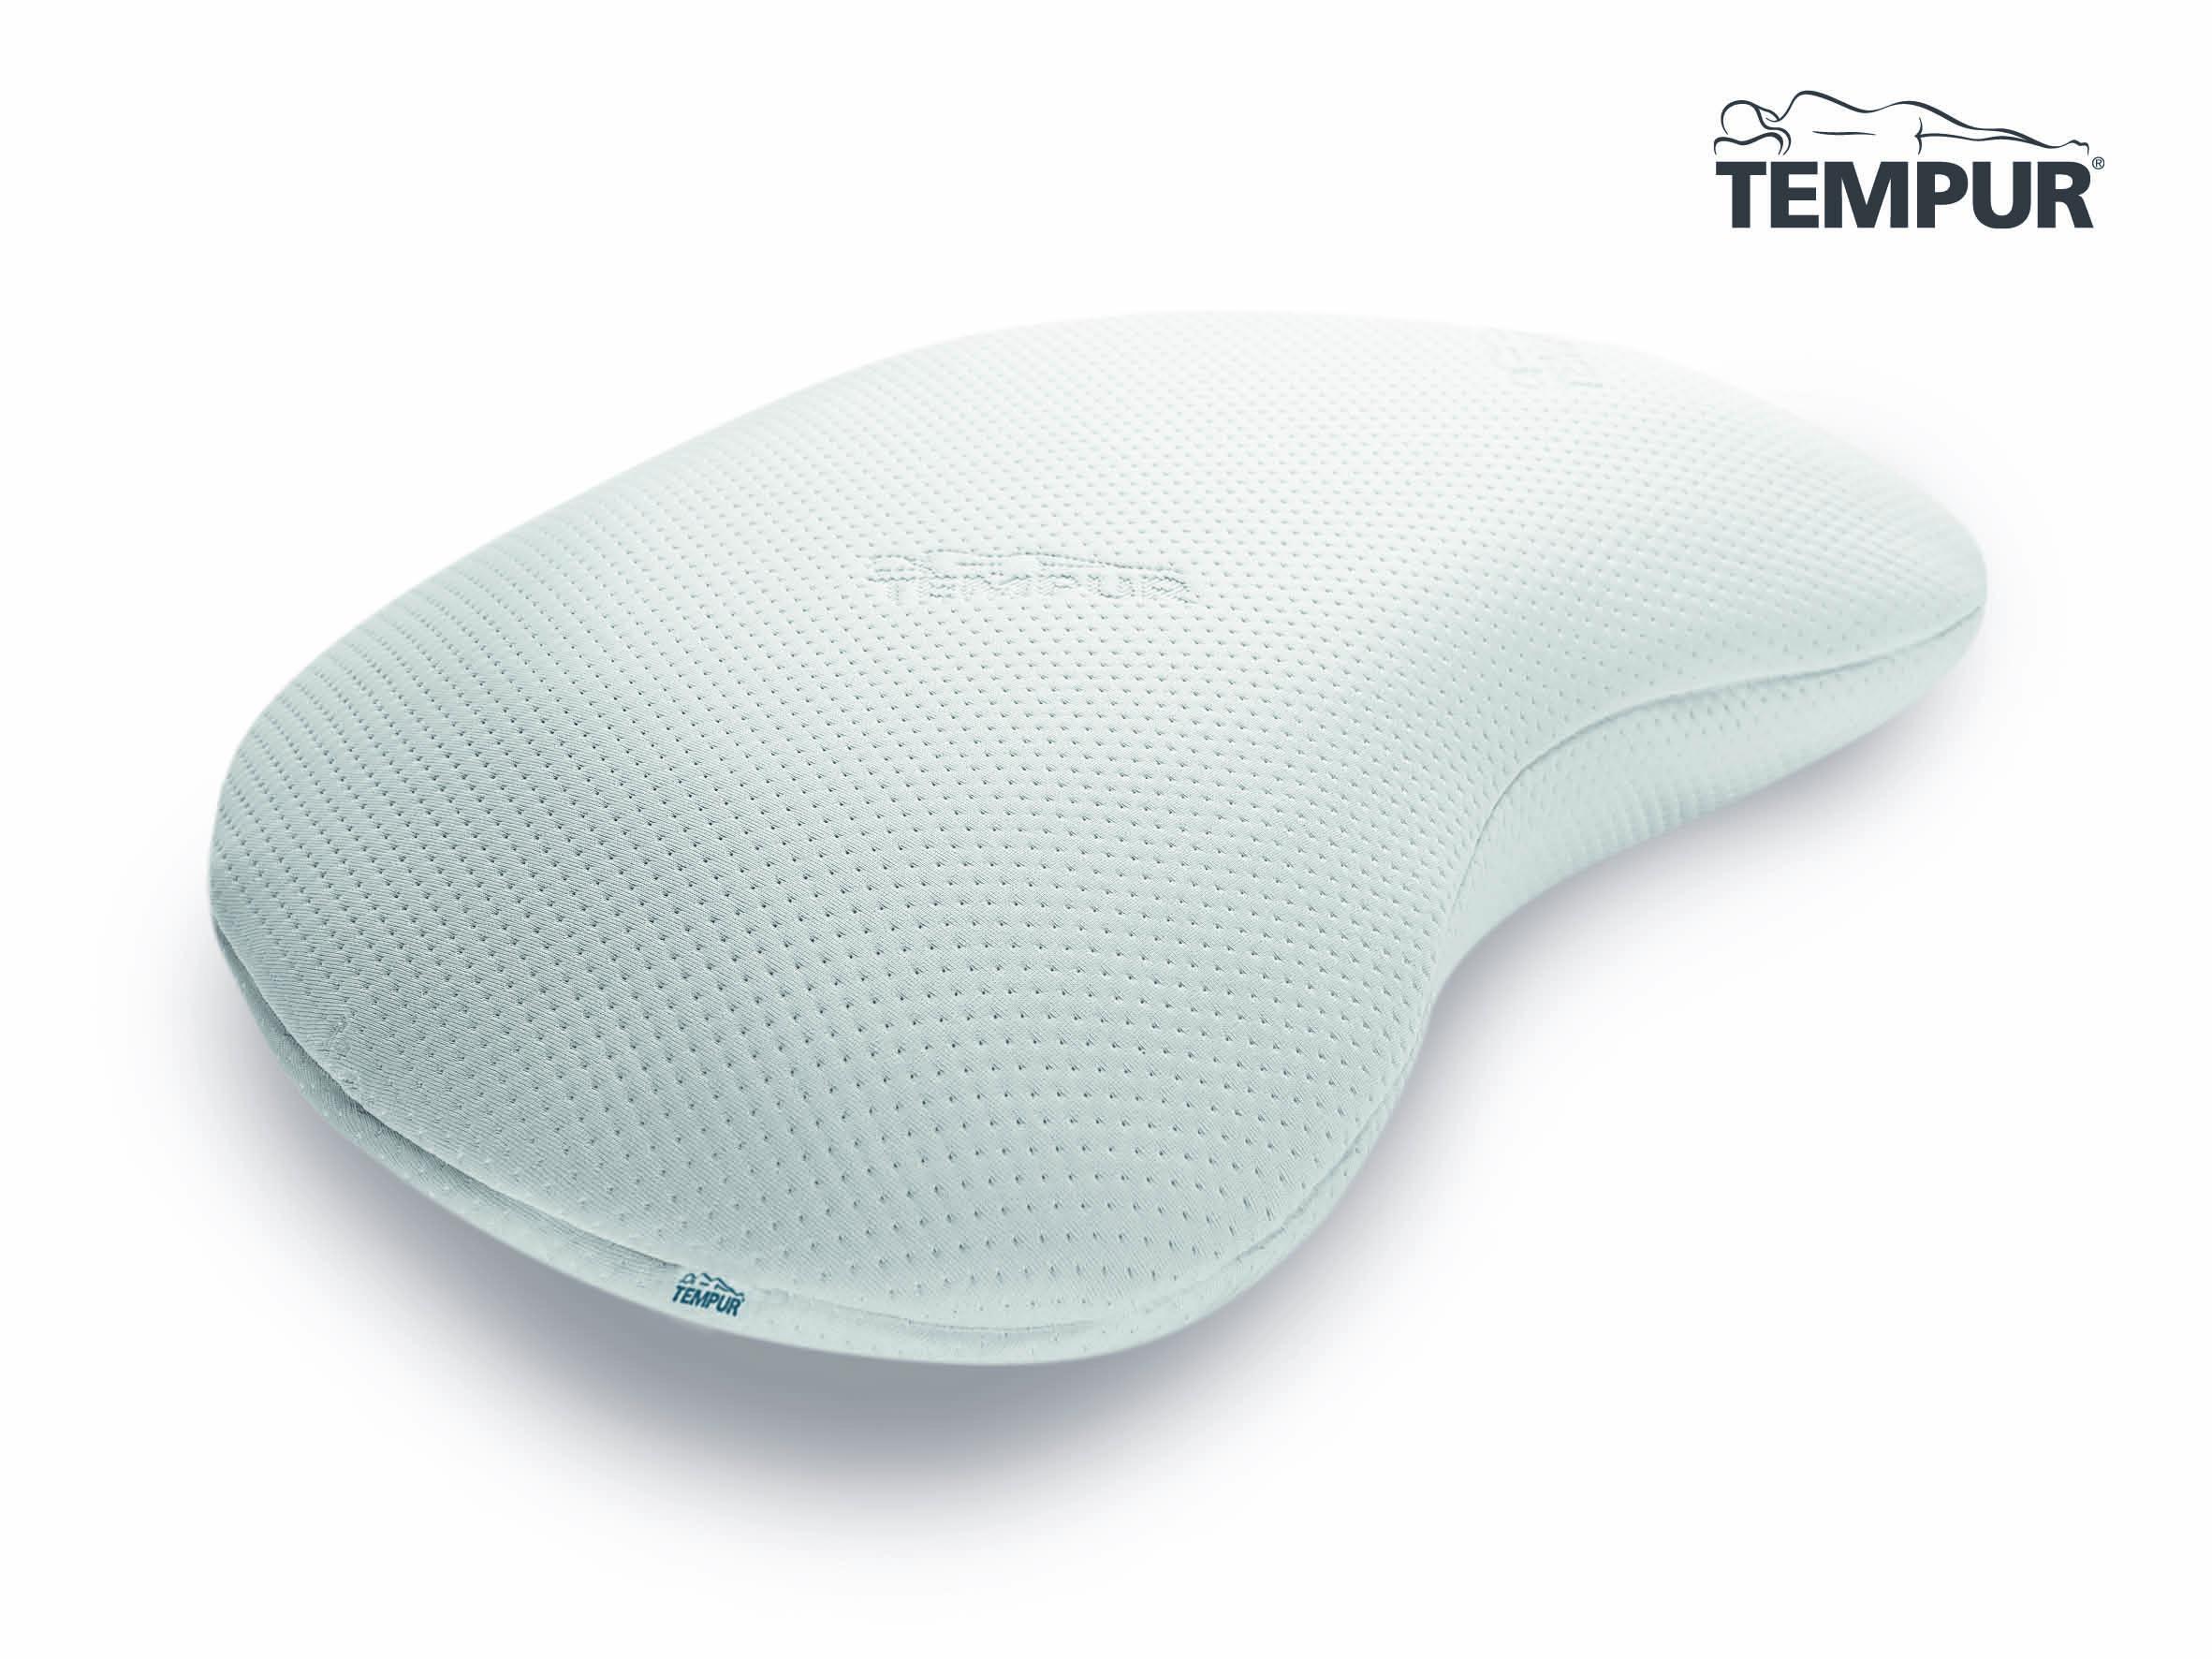 tempur hovedpude TEMPUR® Sonata pude (BEGRÆNSET ANTAL)  33% | Sengestudiet tempur hovedpude